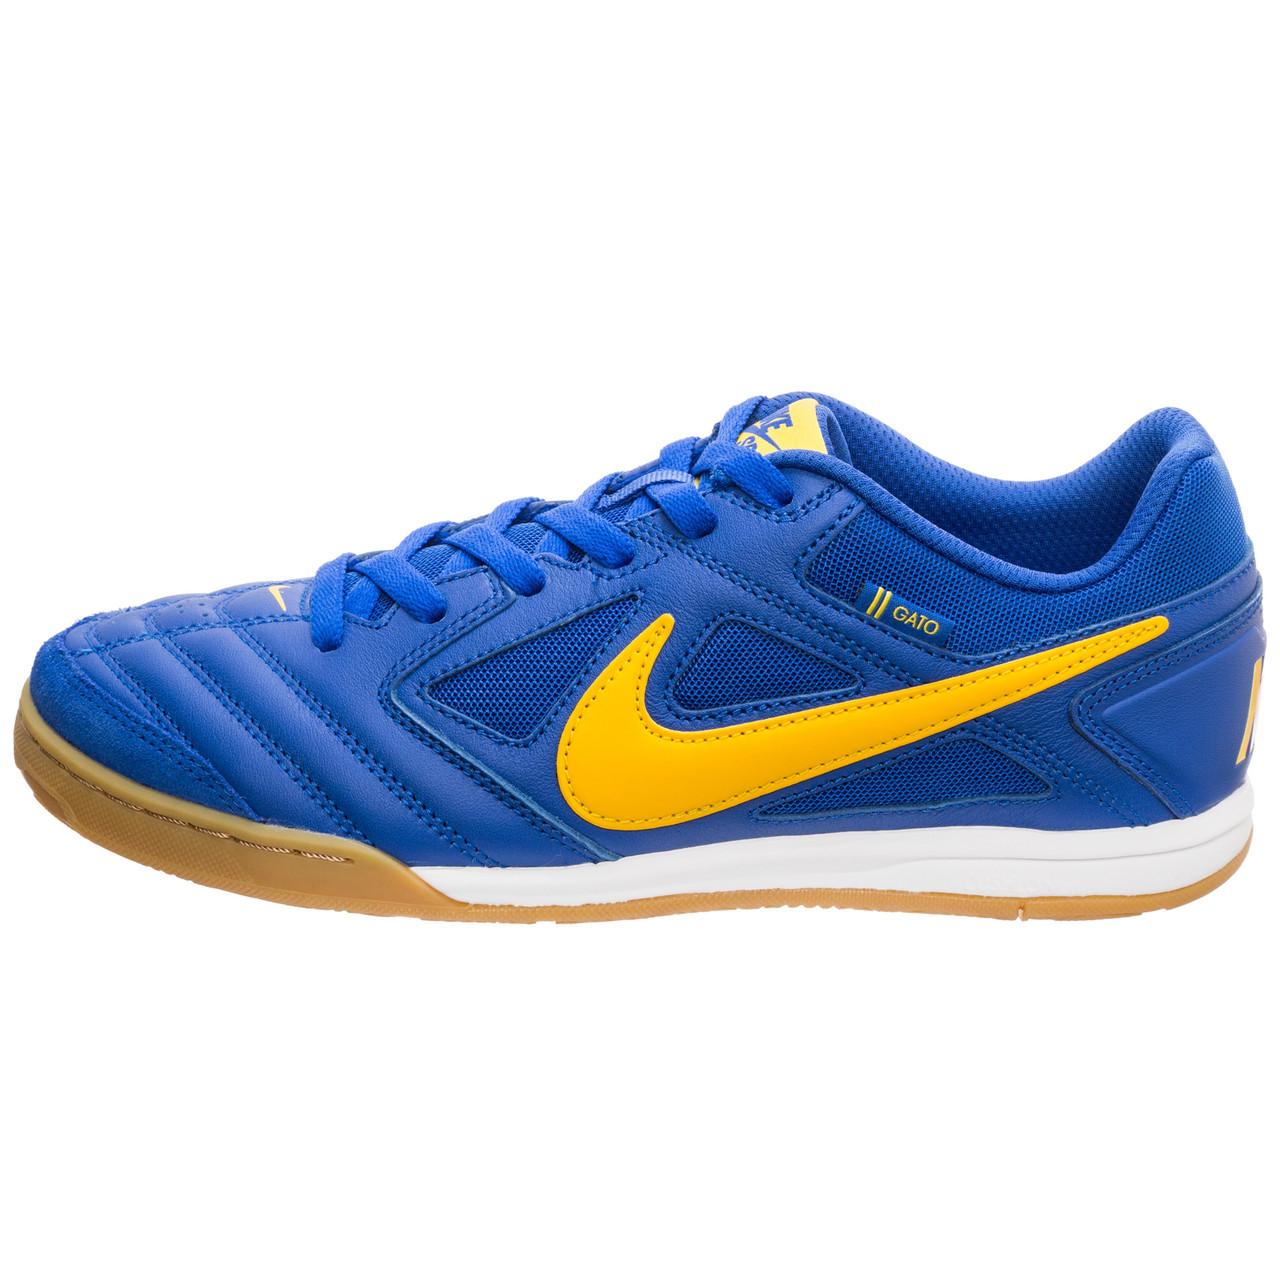 Футзалки (бампы) Nike SB Gato AT4607-400 - Оригинал